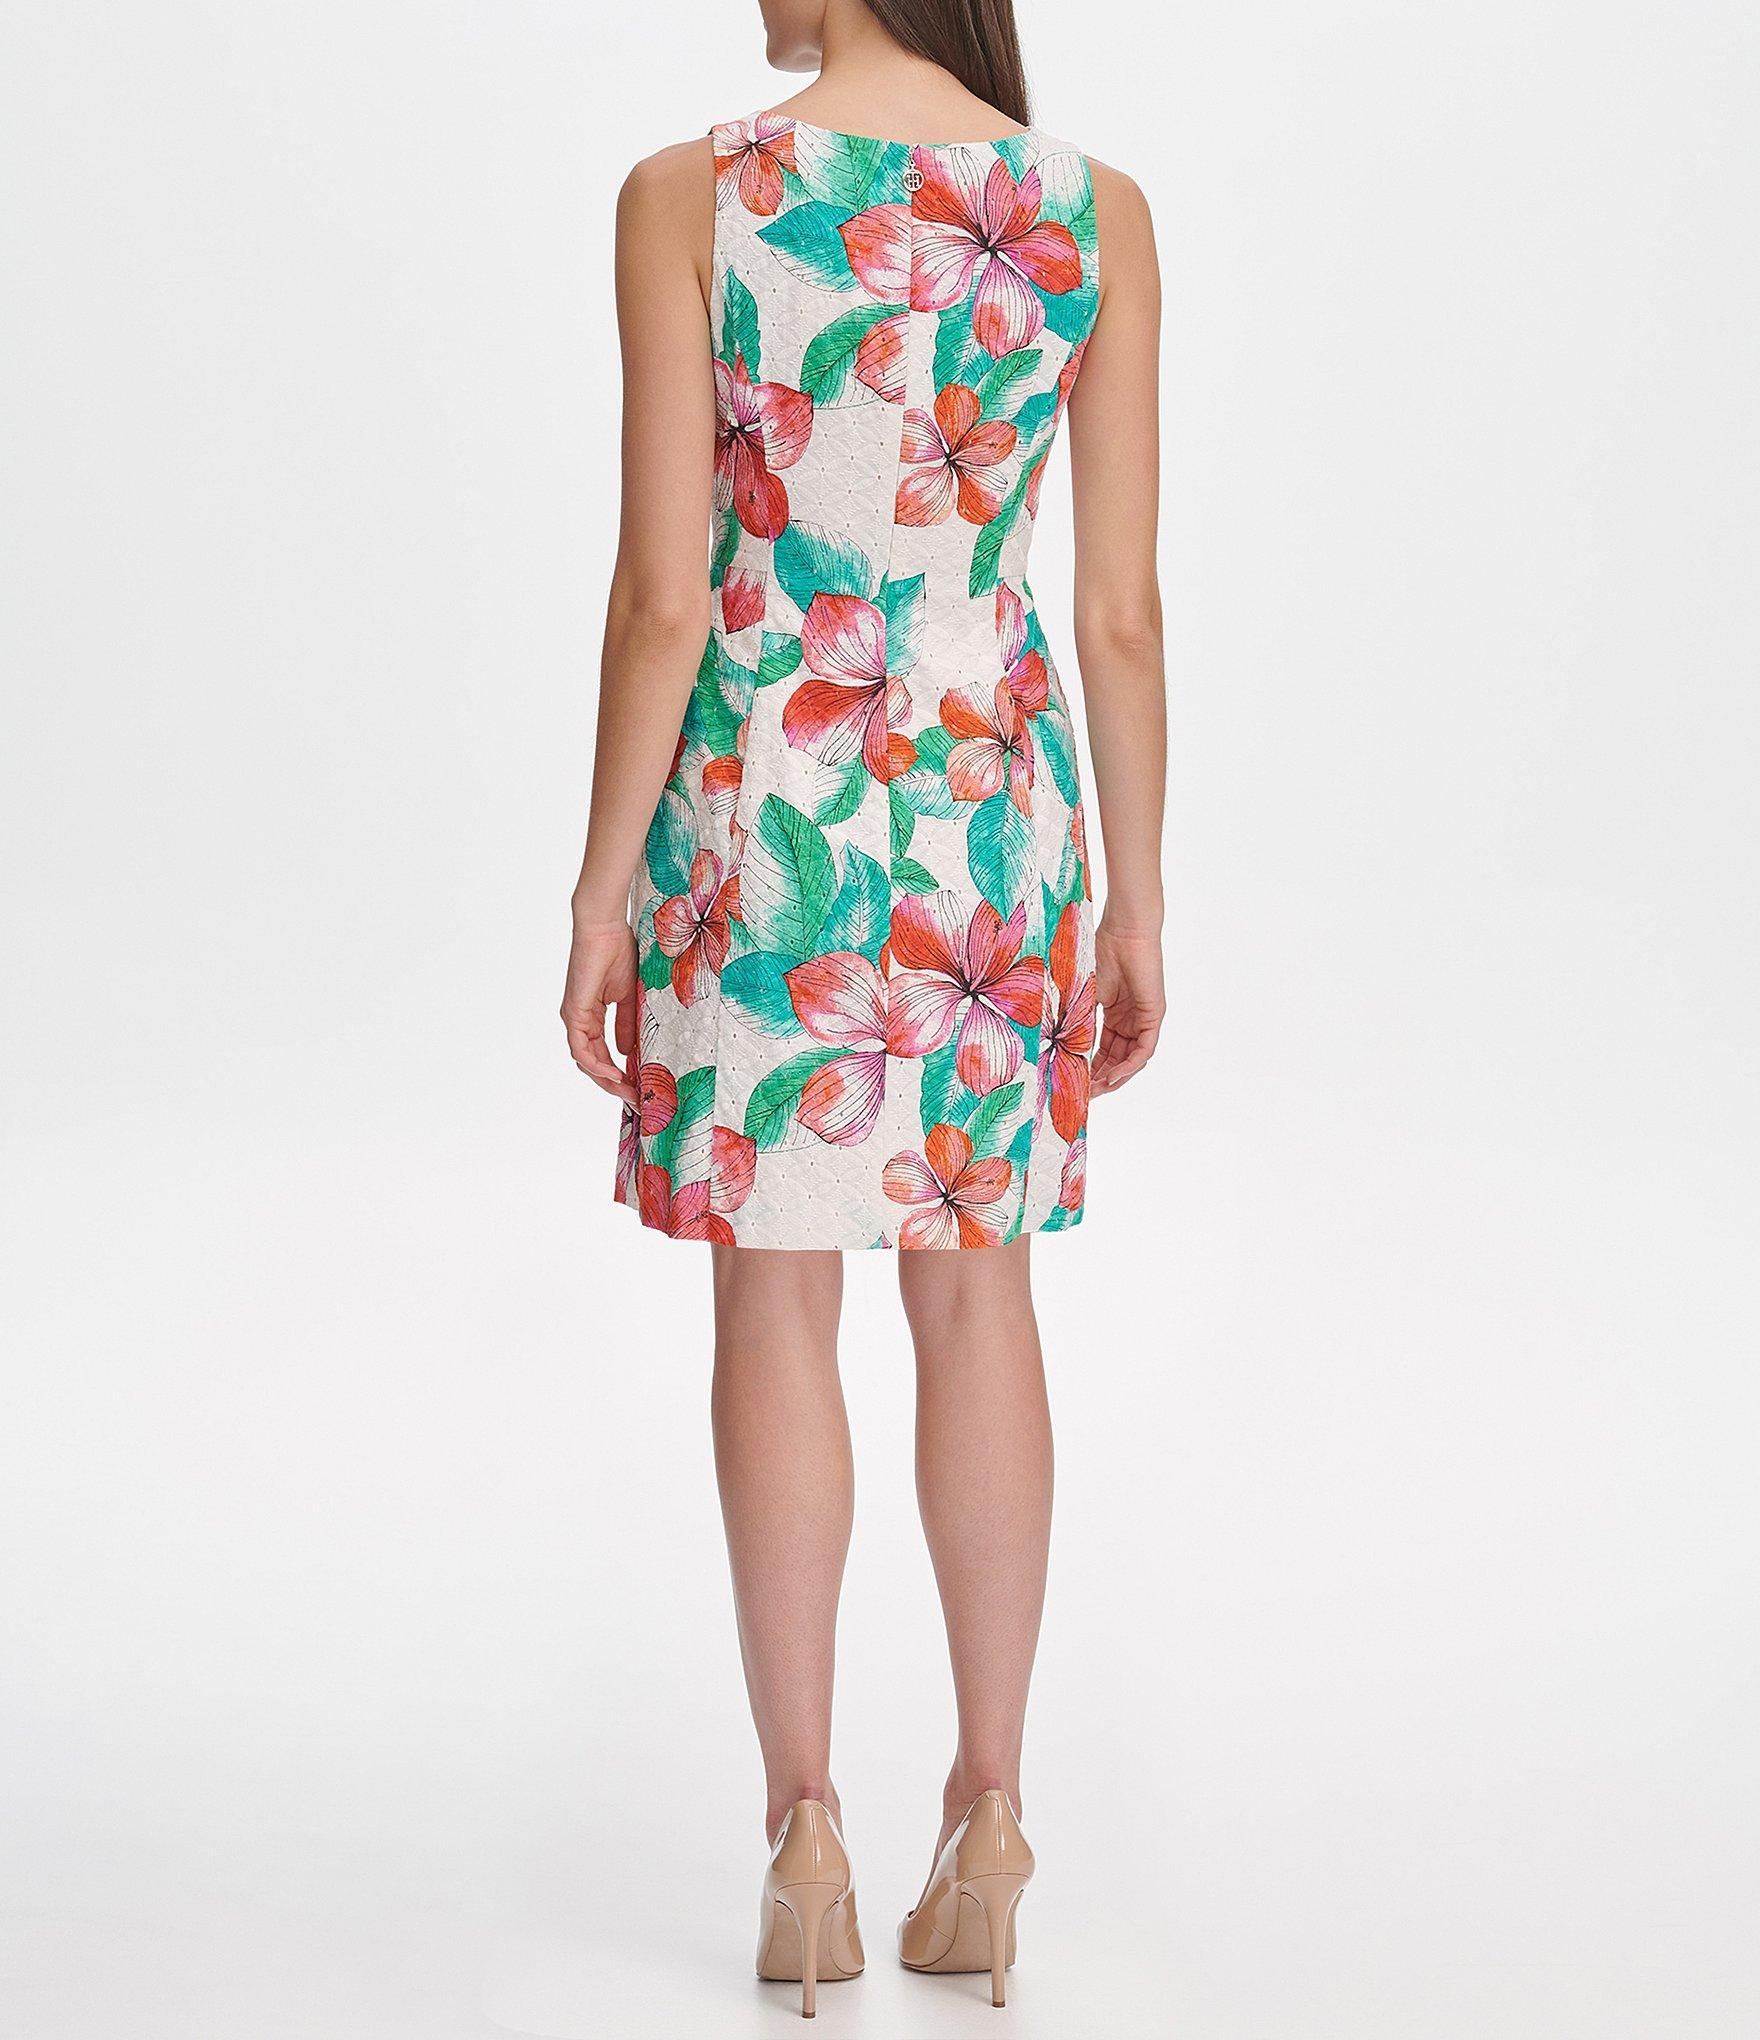 b859b6f49b7 Tommy Hilfiger - White Eyelet Hibiscus Floral Print Fit & Flare Dress - Lyst.  View fullscreen